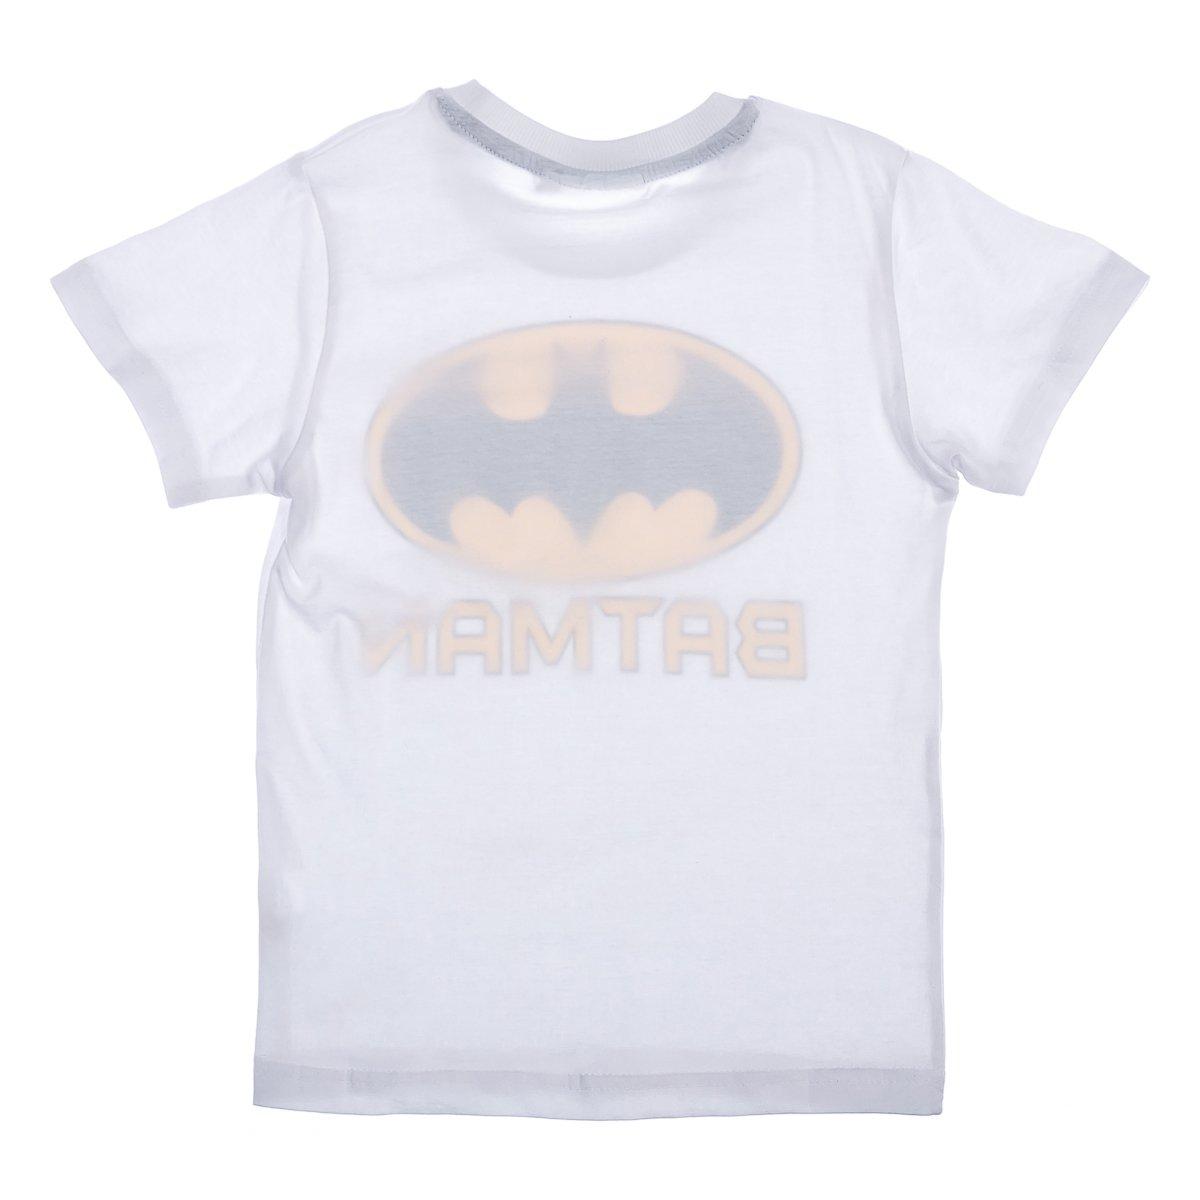 Купить Футболки, майки, топы, туники, Футболка E Plus M Batman White, р. 122 BAT5202184 ТМ: E Plus M, белый